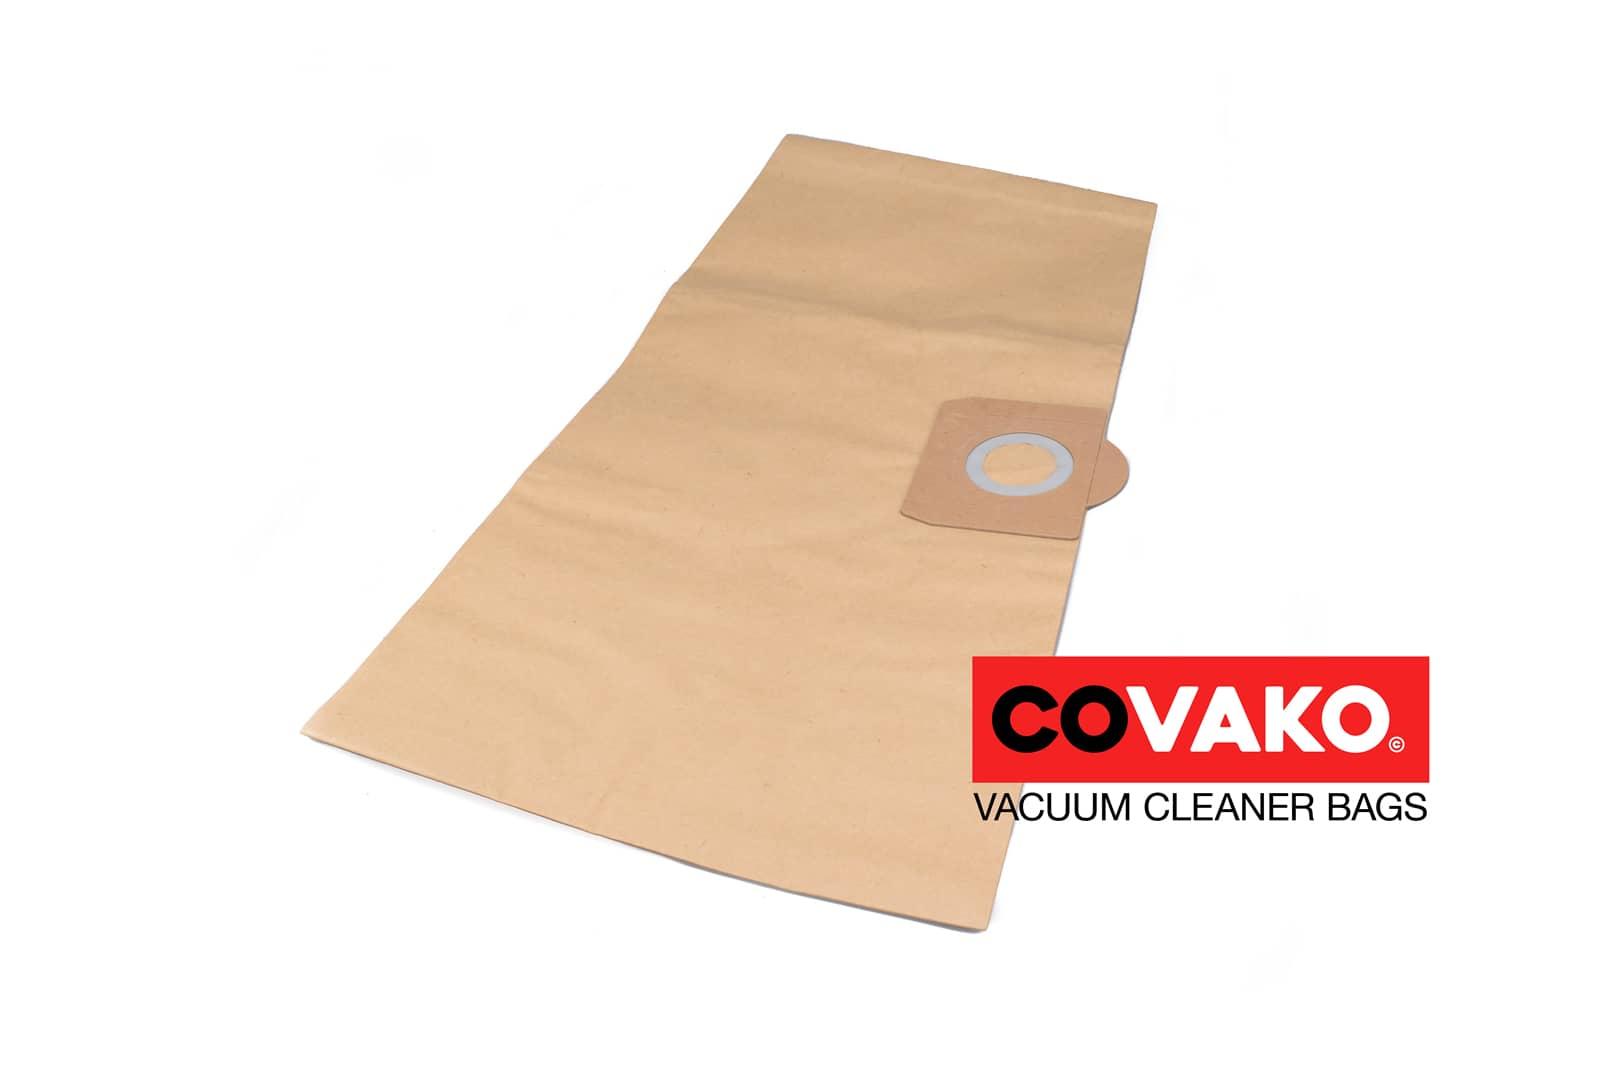 Nilco IC 314 / Paper - Nilco vacuum cleaner bags